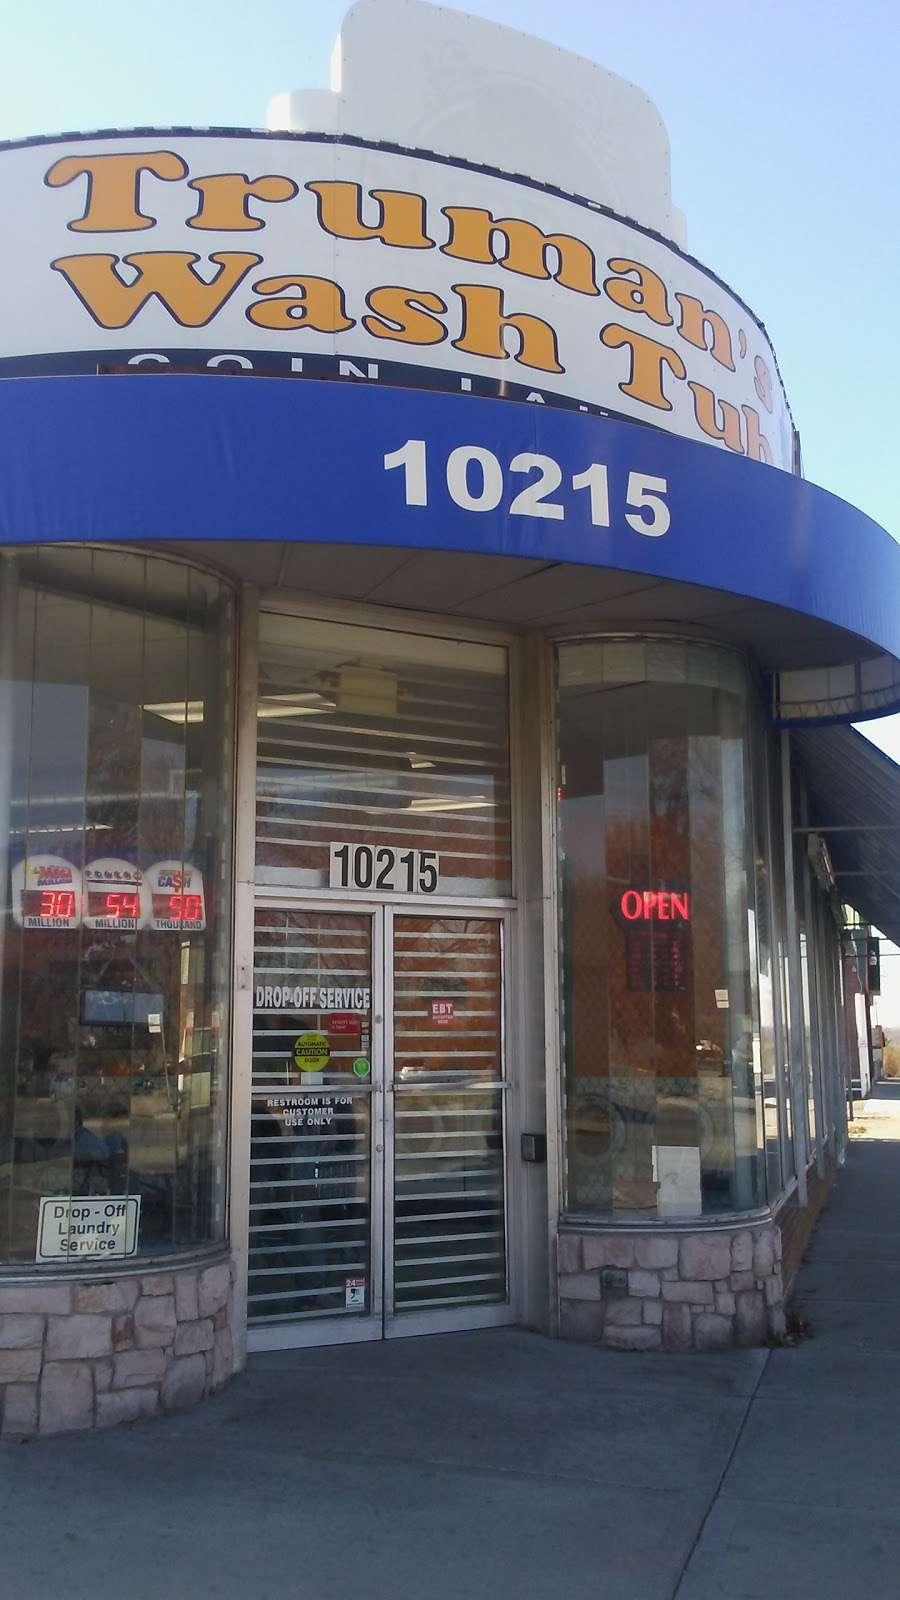 Truman Wash Tub - laundry  | Photo 9 of 10 | Address: 10215 E Truman Rd, Independence, MO 64052, USA | Phone: (816) 503-8593